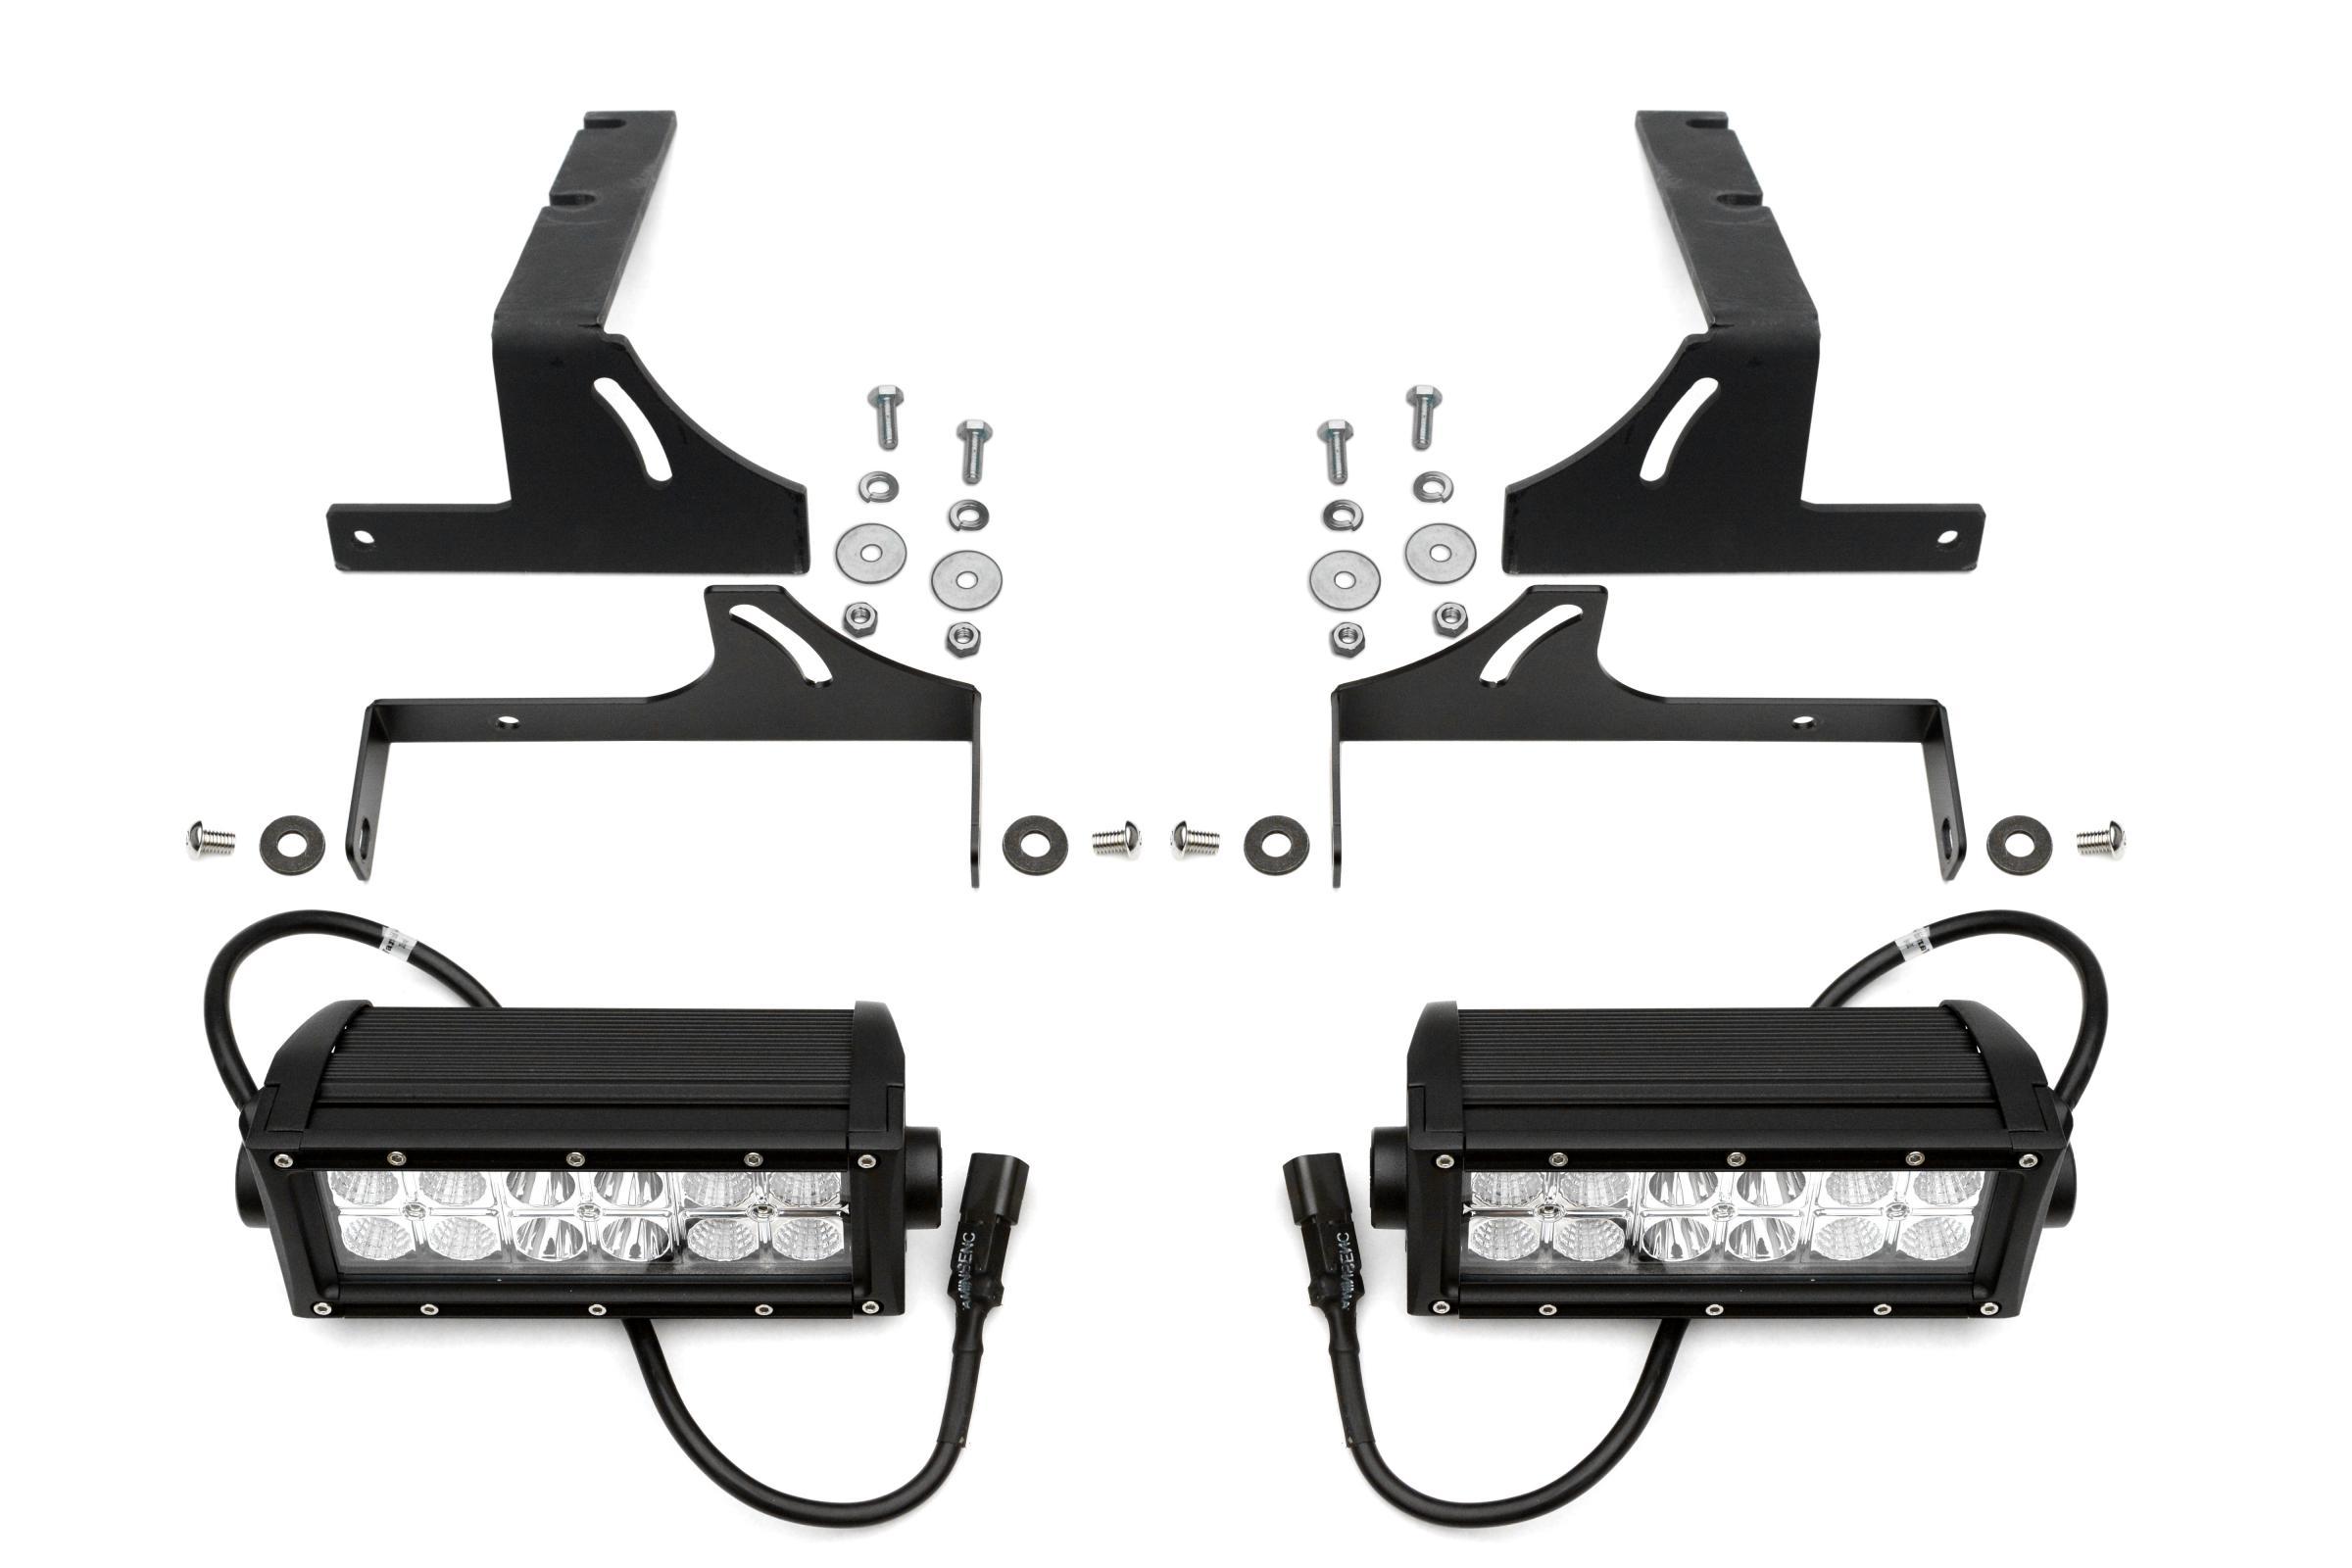 Rear Bumper Frame Led Light Bar Mount Kit 2005 2015 Tacoma Swivel Wiring For Adjustments W